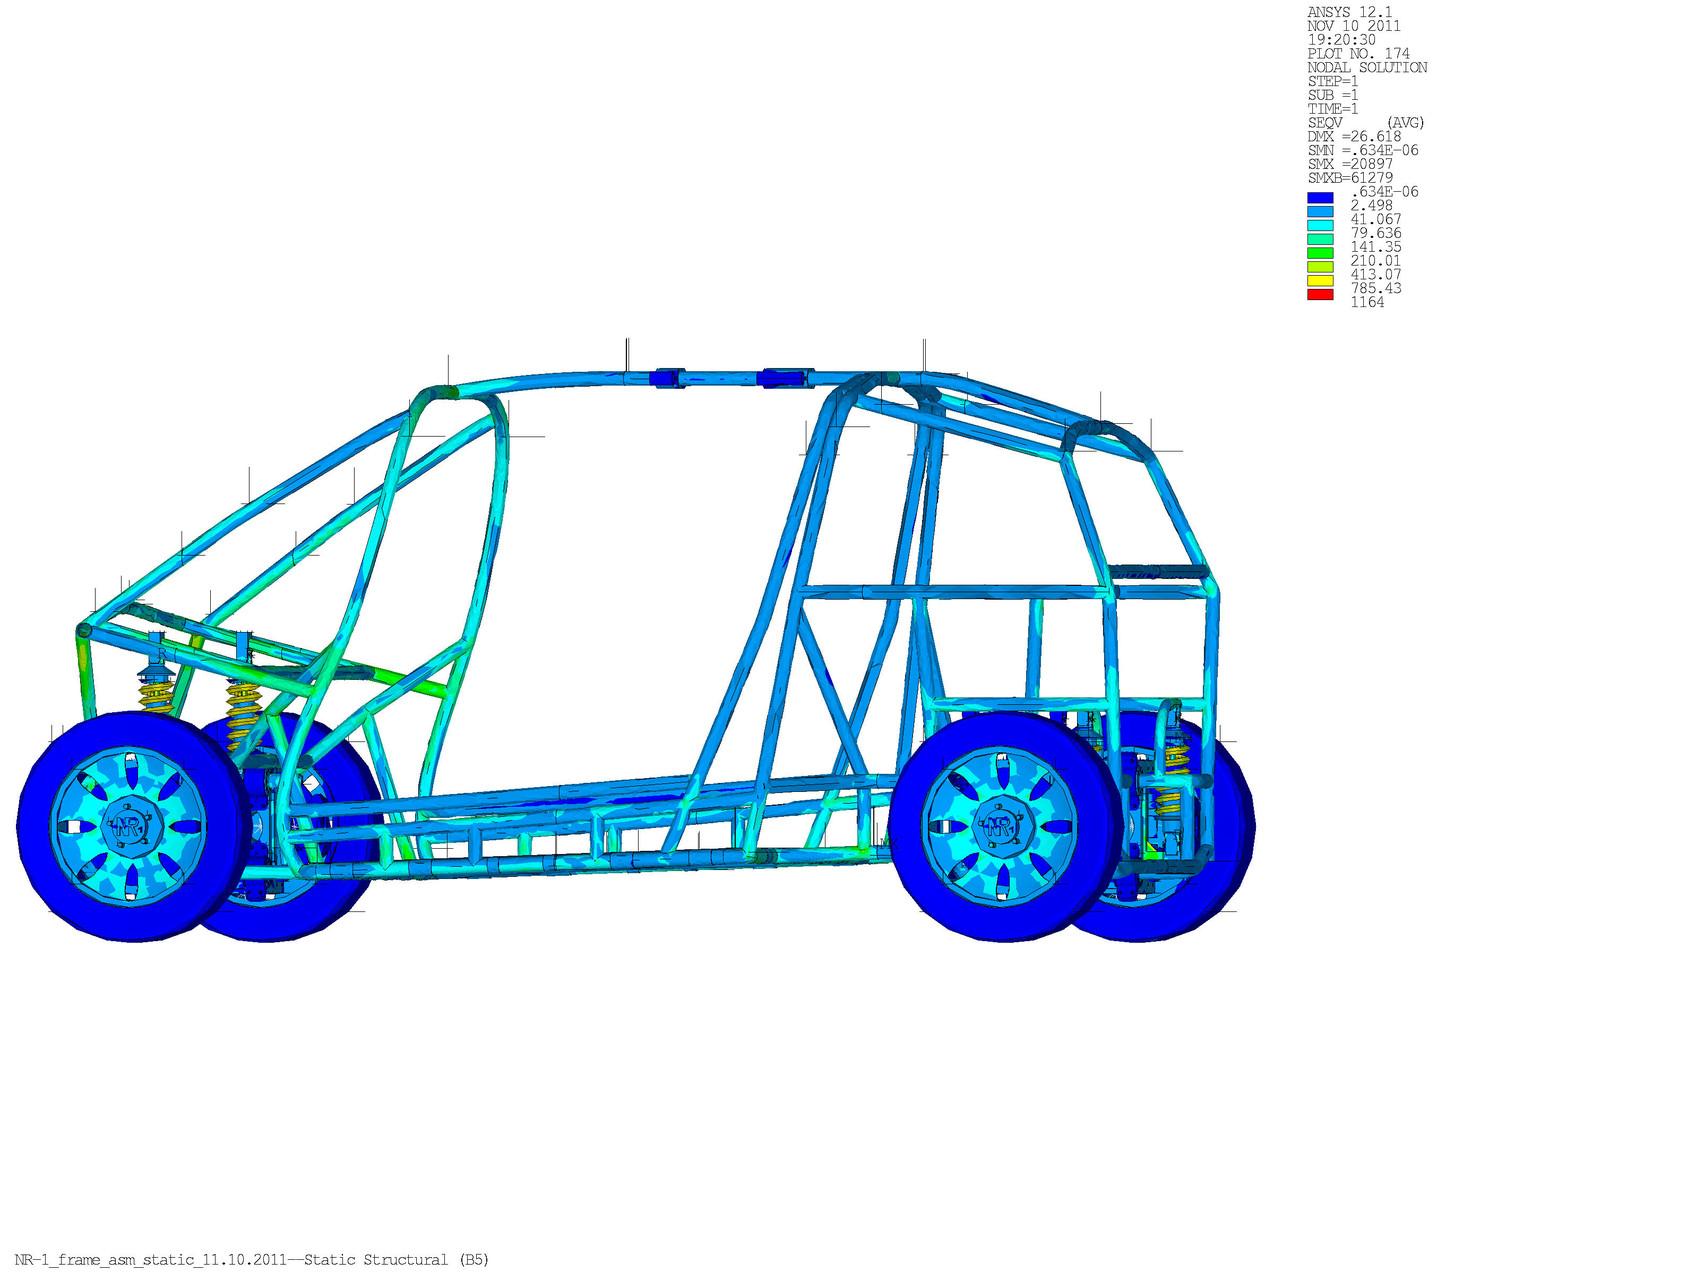 NR-1 Supermileage Car --200 Miles Per Gallon-- Space Frame Stress Analysis